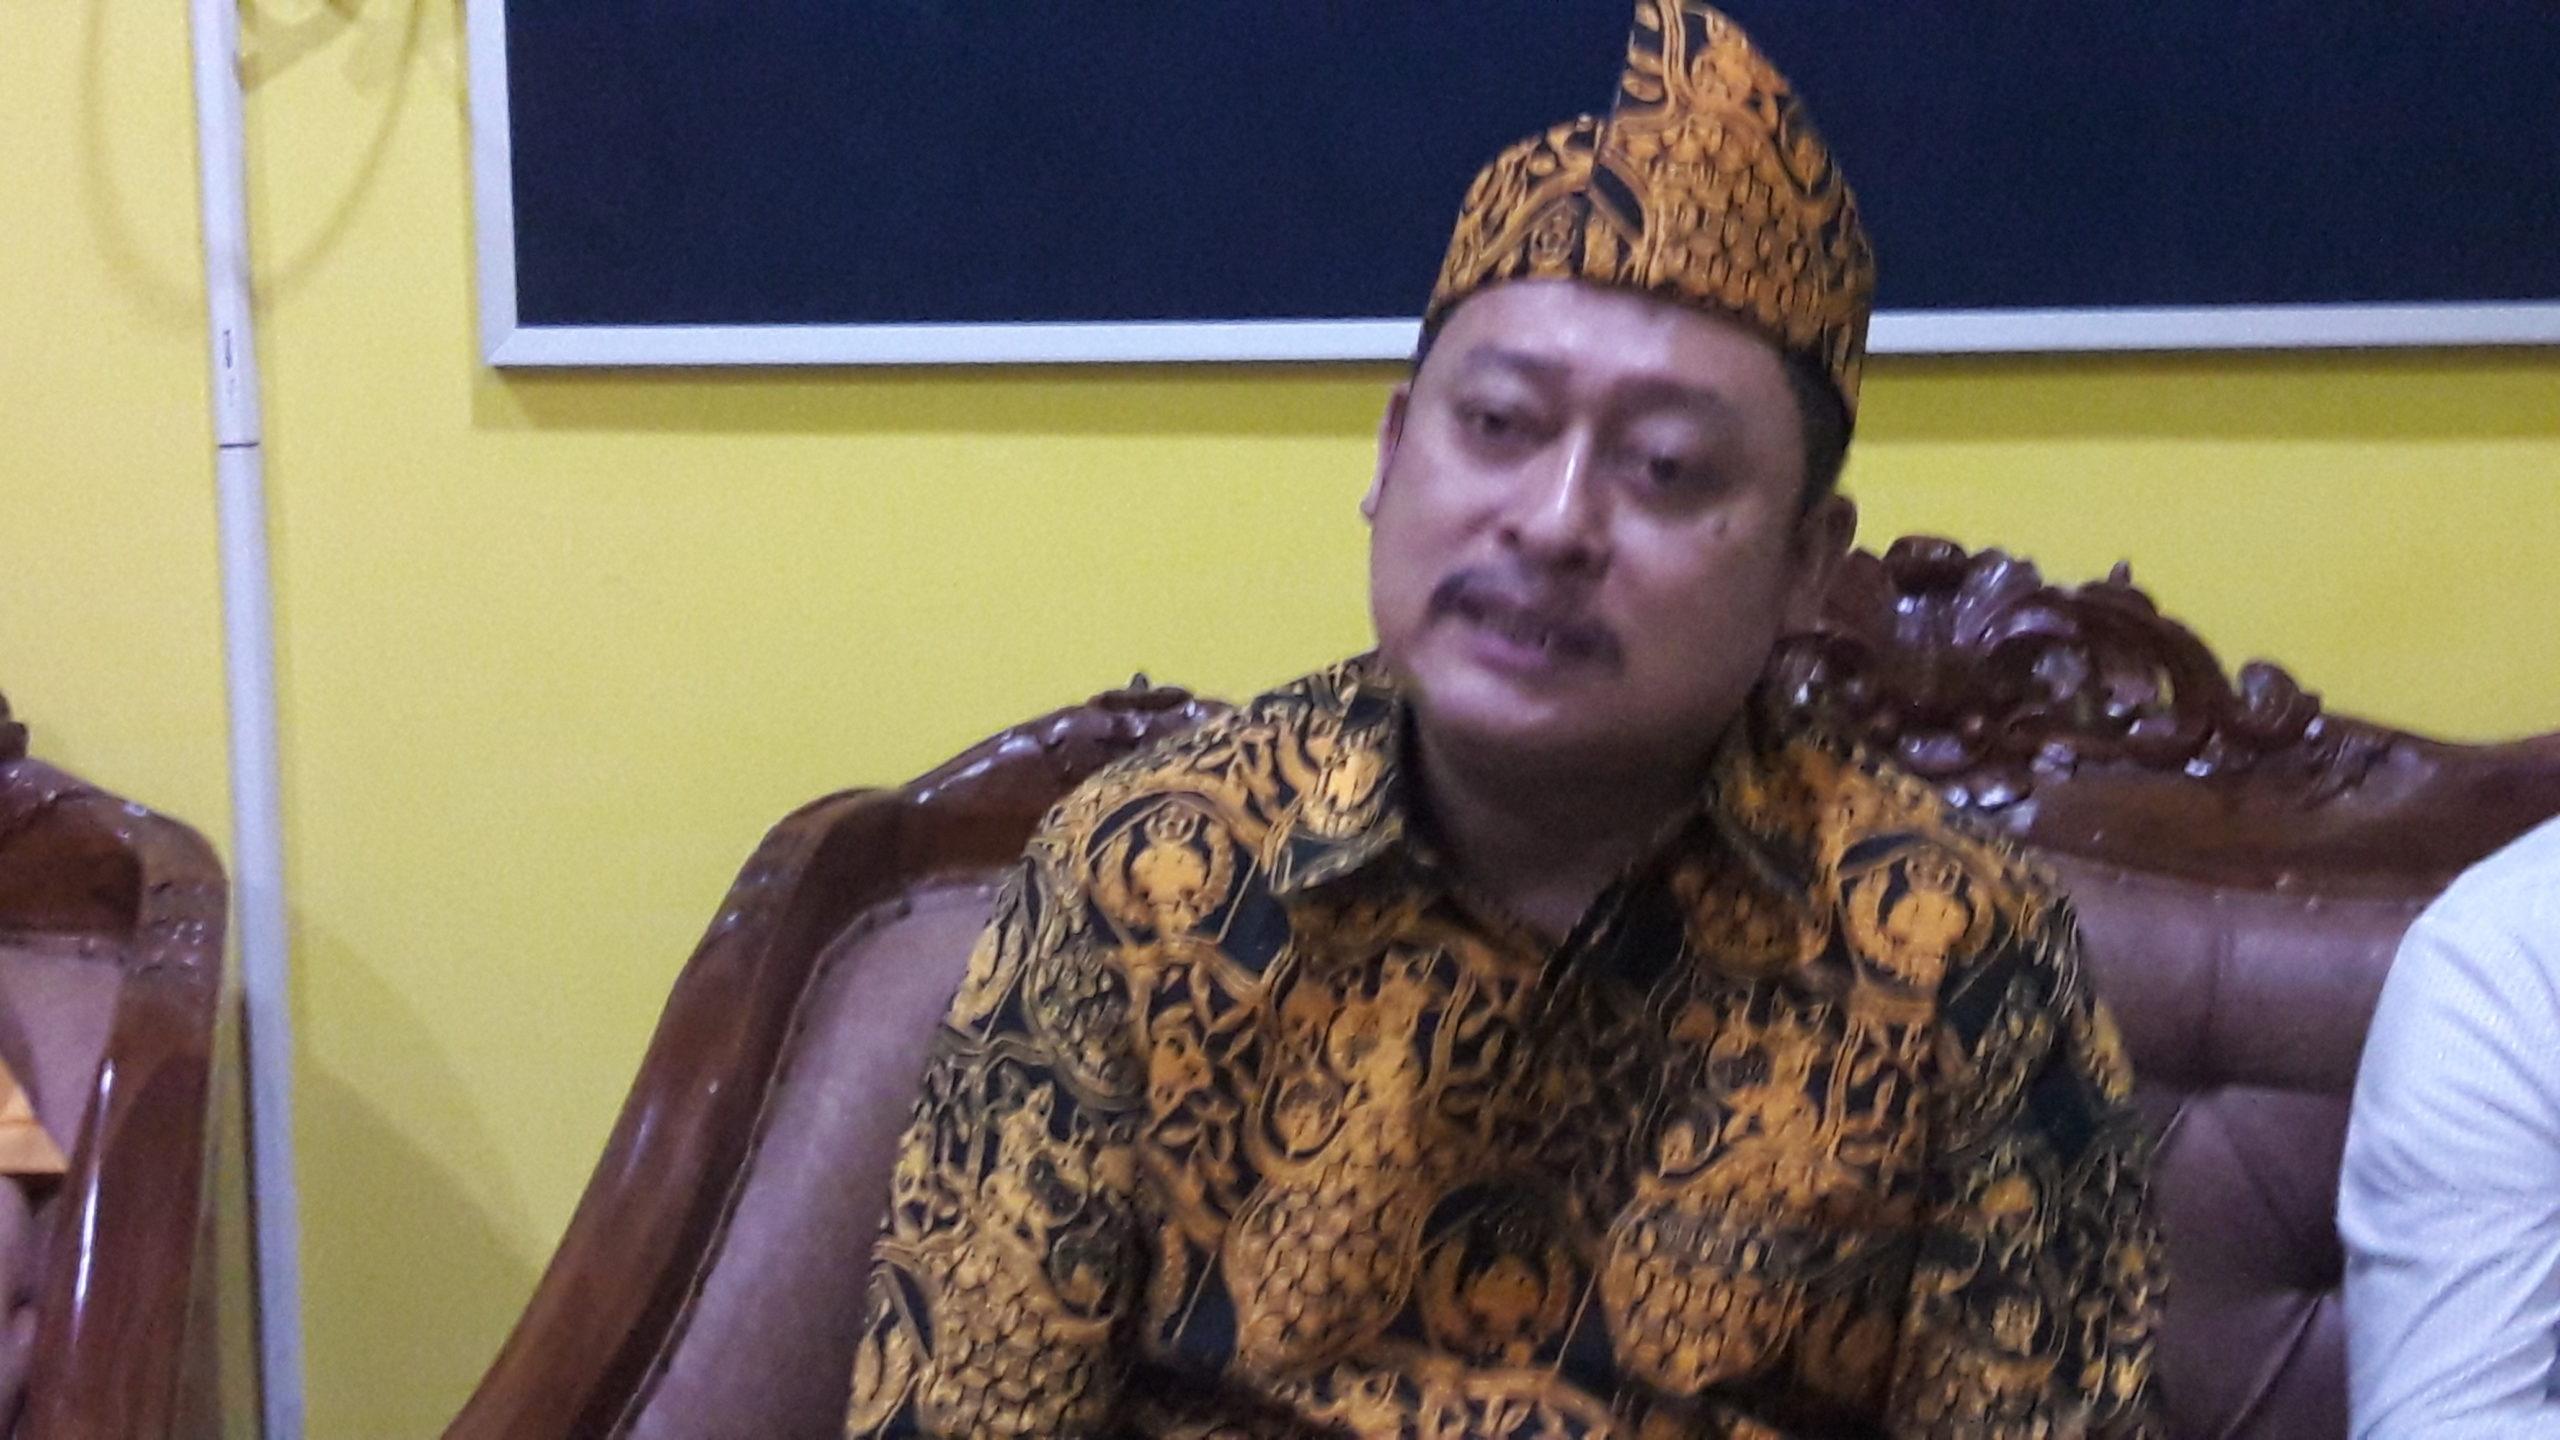 Ketua MKGR Jatim Kodrat Sunyoto saat ditemui di sela-sela kegiatan peringatan HUT Ormas MKGR ke-60 di kantor DPD Partai Golkar Jatim, Jumat (3/1/2020). (Foto: Setya W/NUSANTARANEWS.CO)